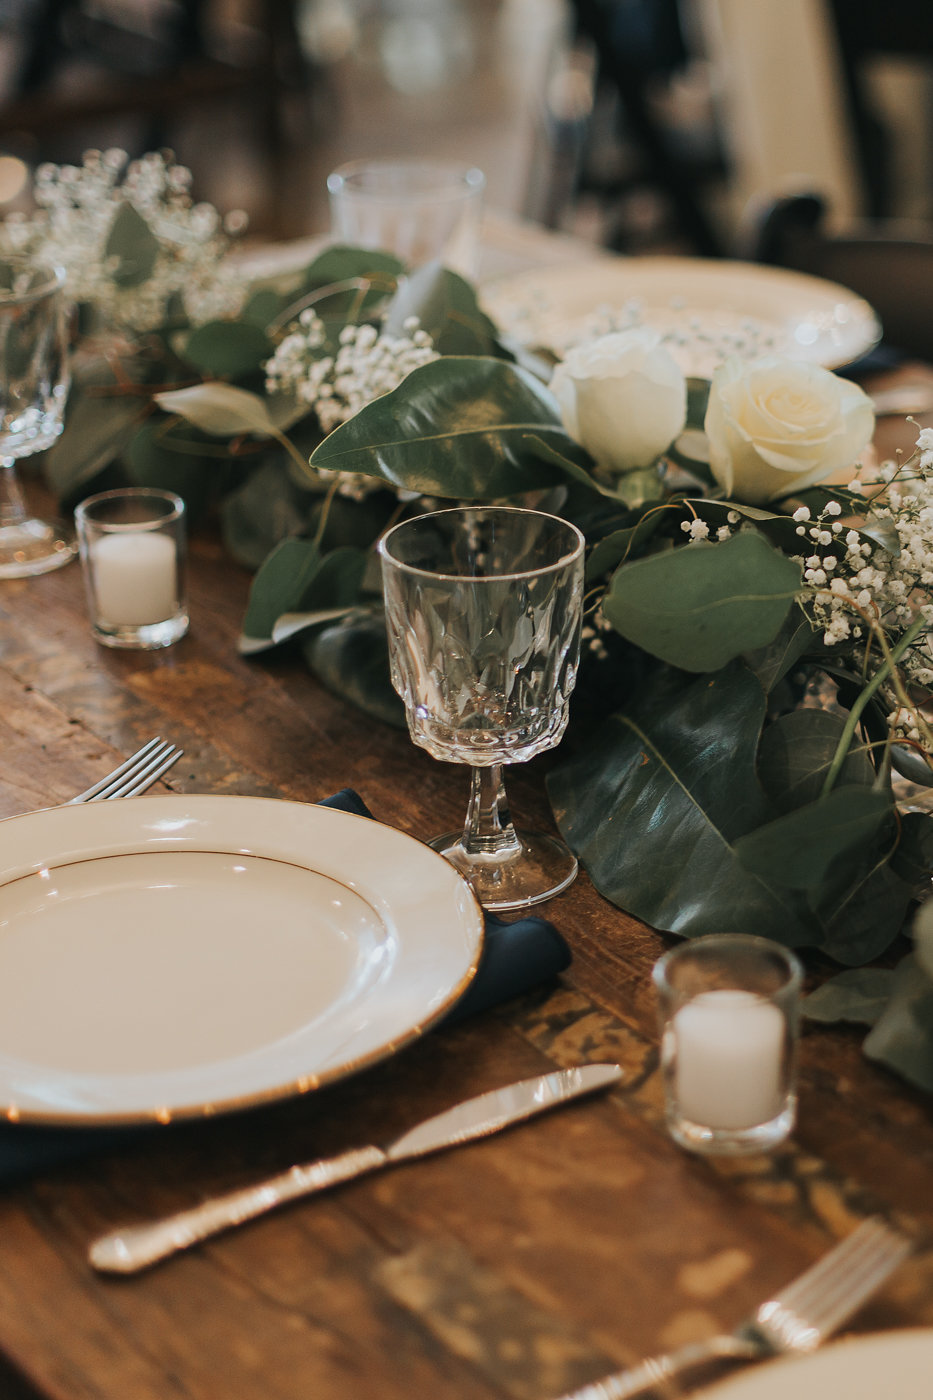 Eucalyptus Wedding Table Runner - North Carolina Wedding Venue - Triple J Manor House Wedding